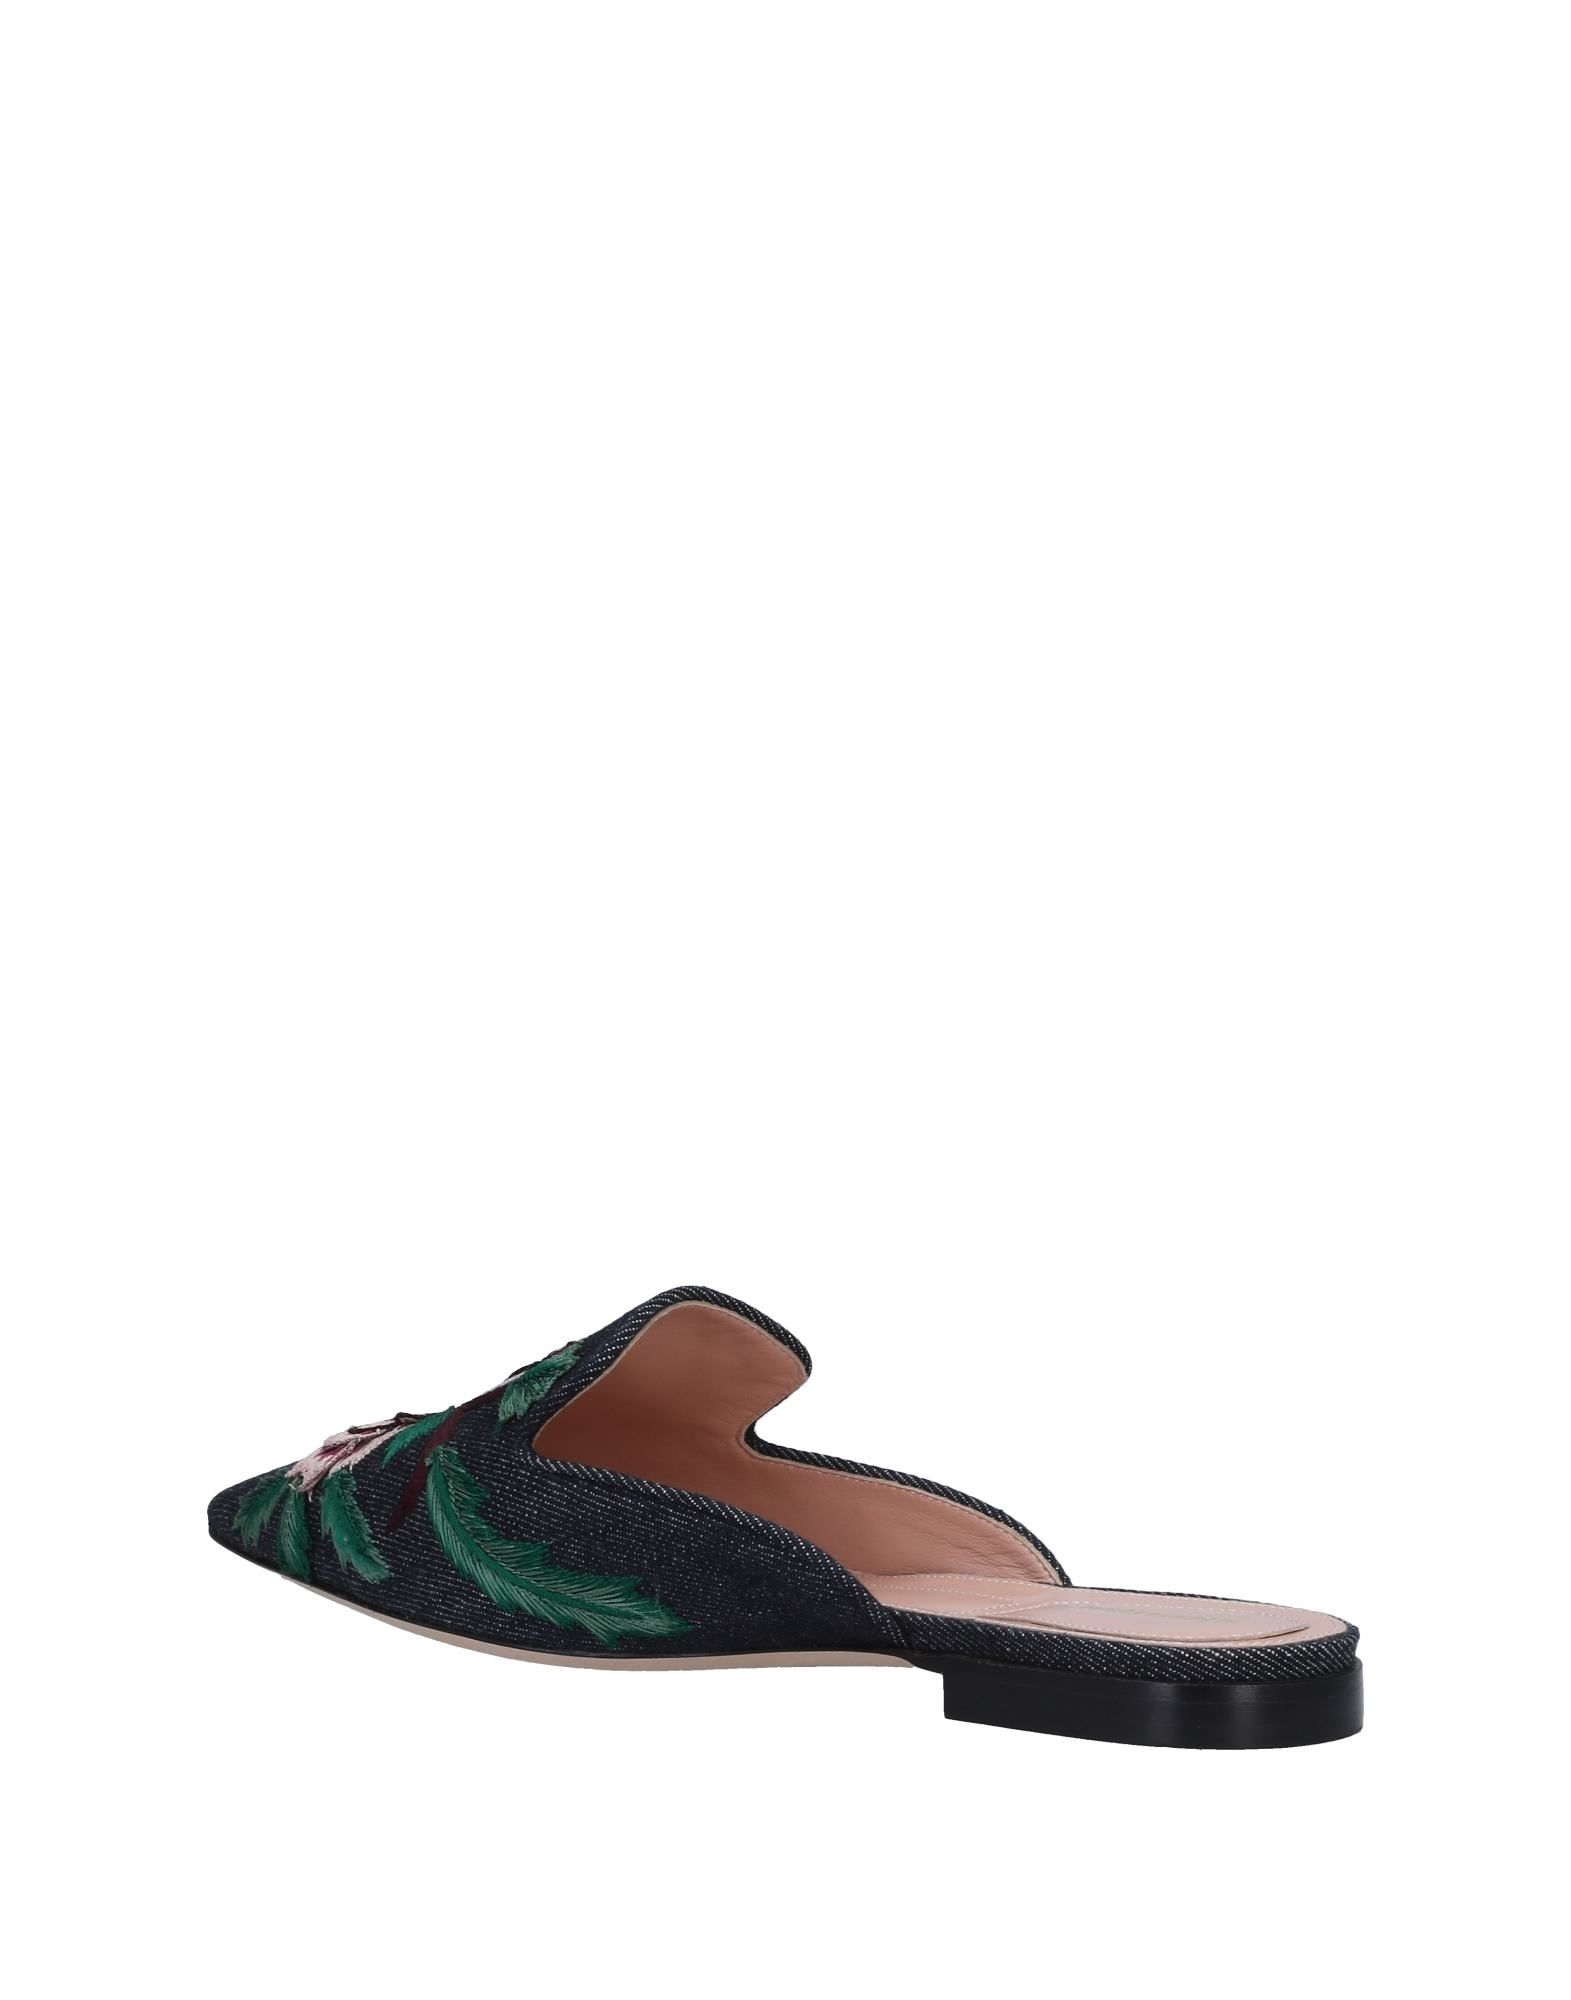 Alberta Ferretti Pantoletten Damen  Schuhe 11495889RCGünstige gut aussehende Schuhe  e3095c